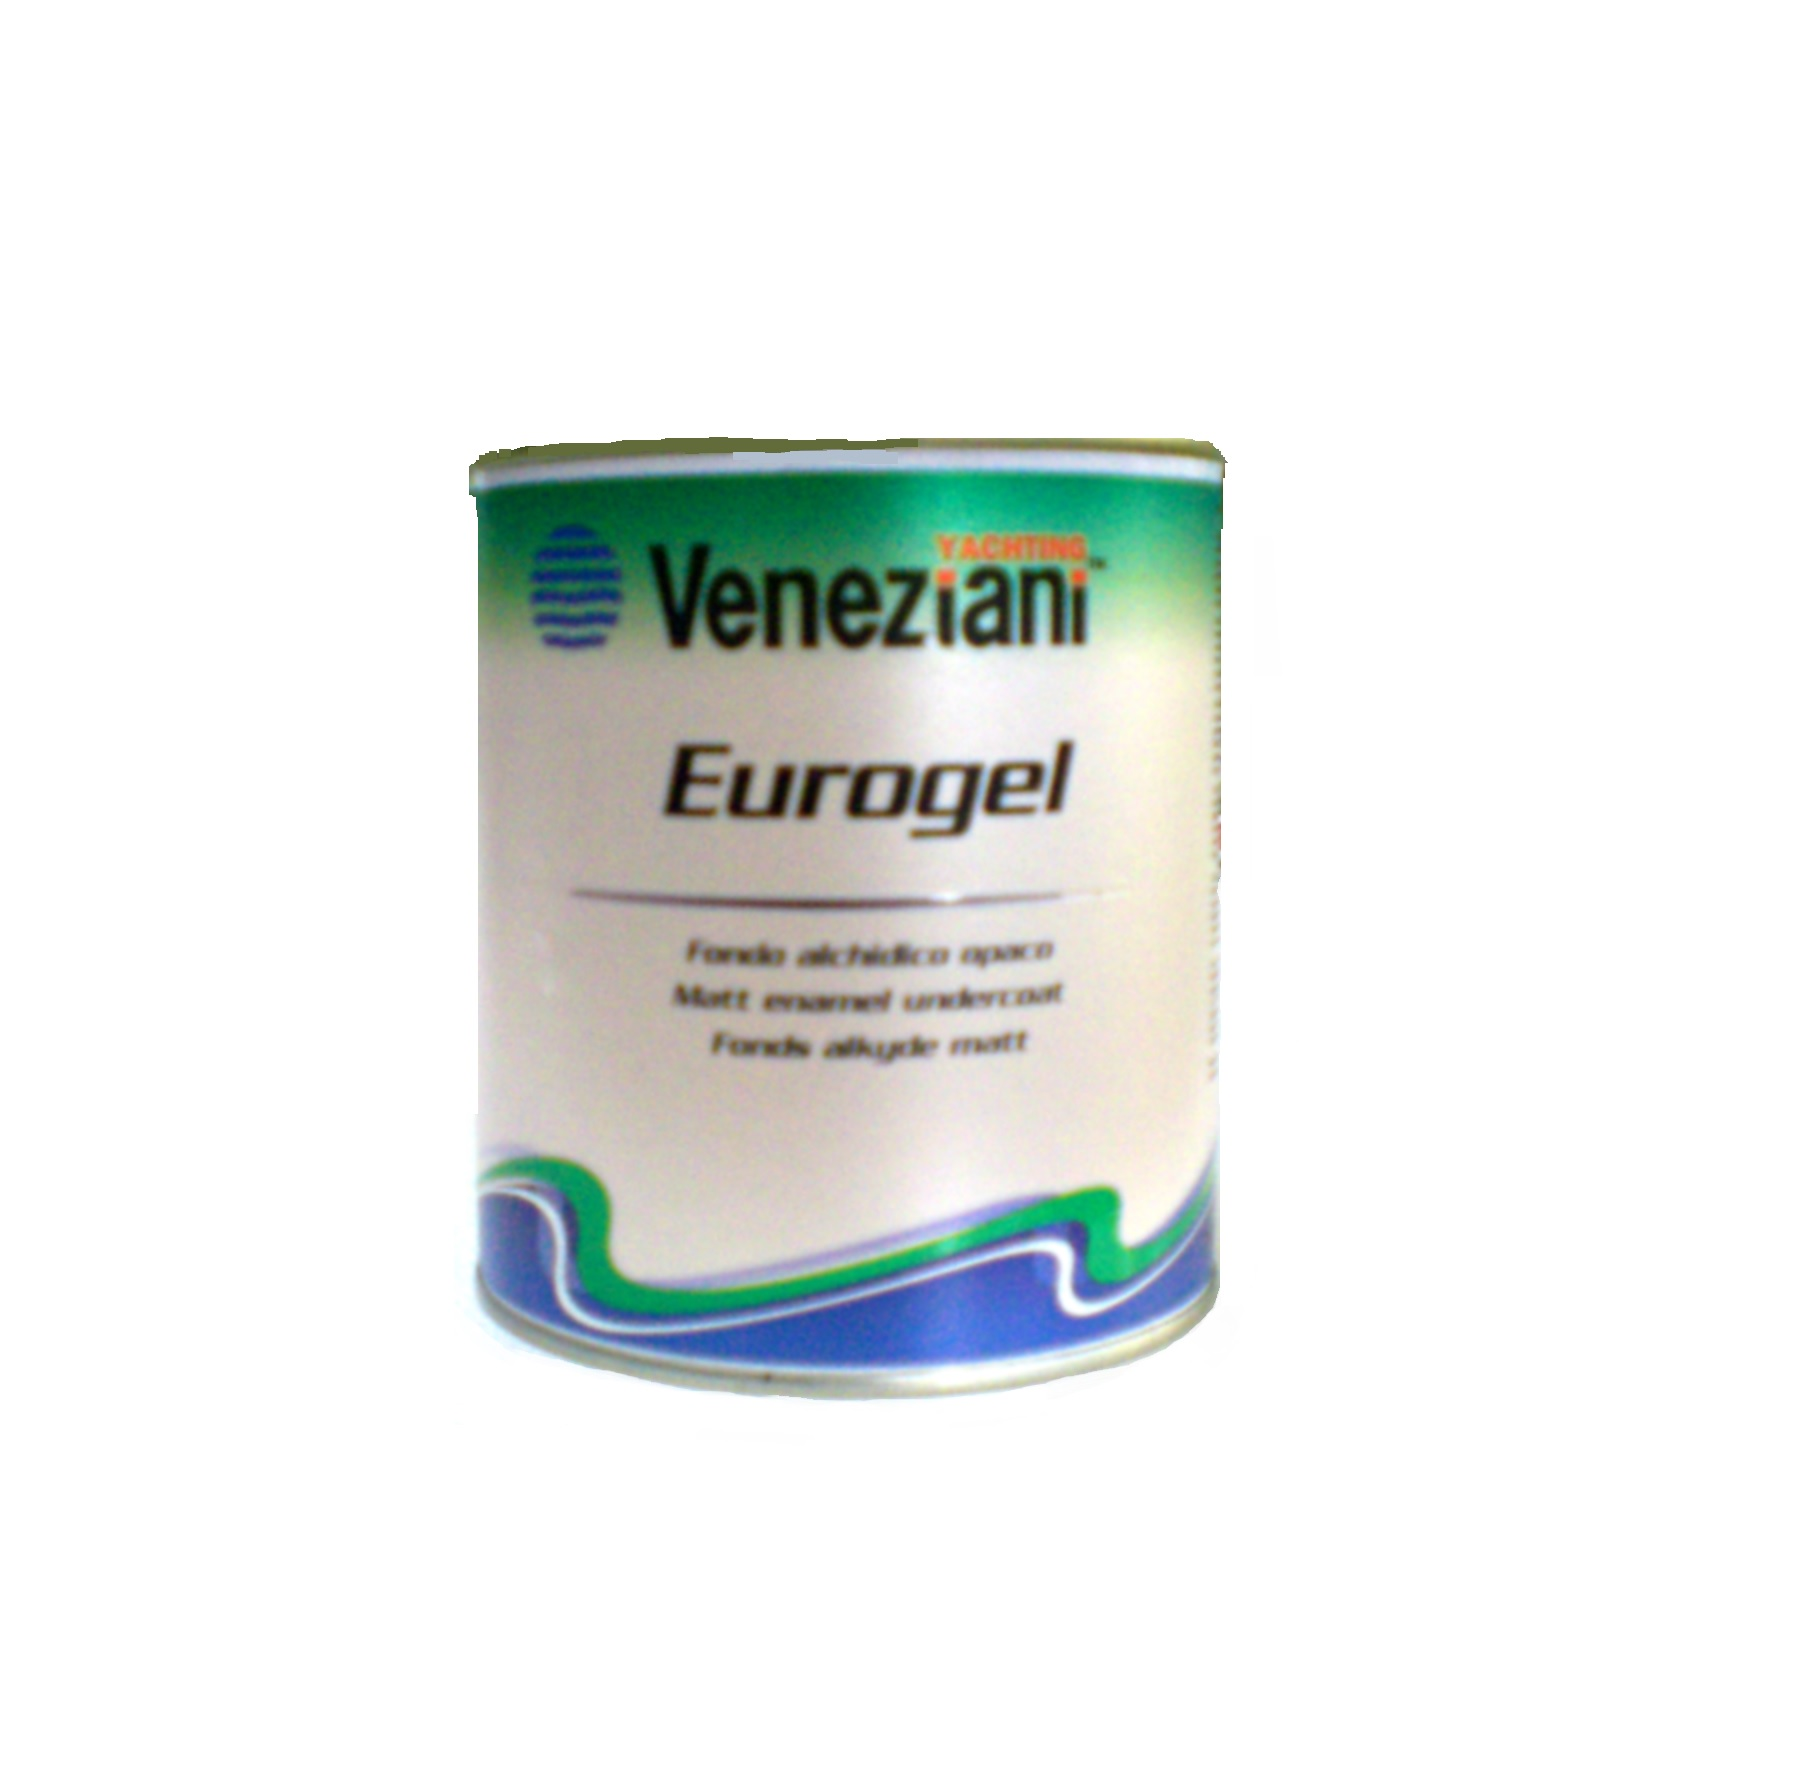 Eurogel-fondo alchidico opaco